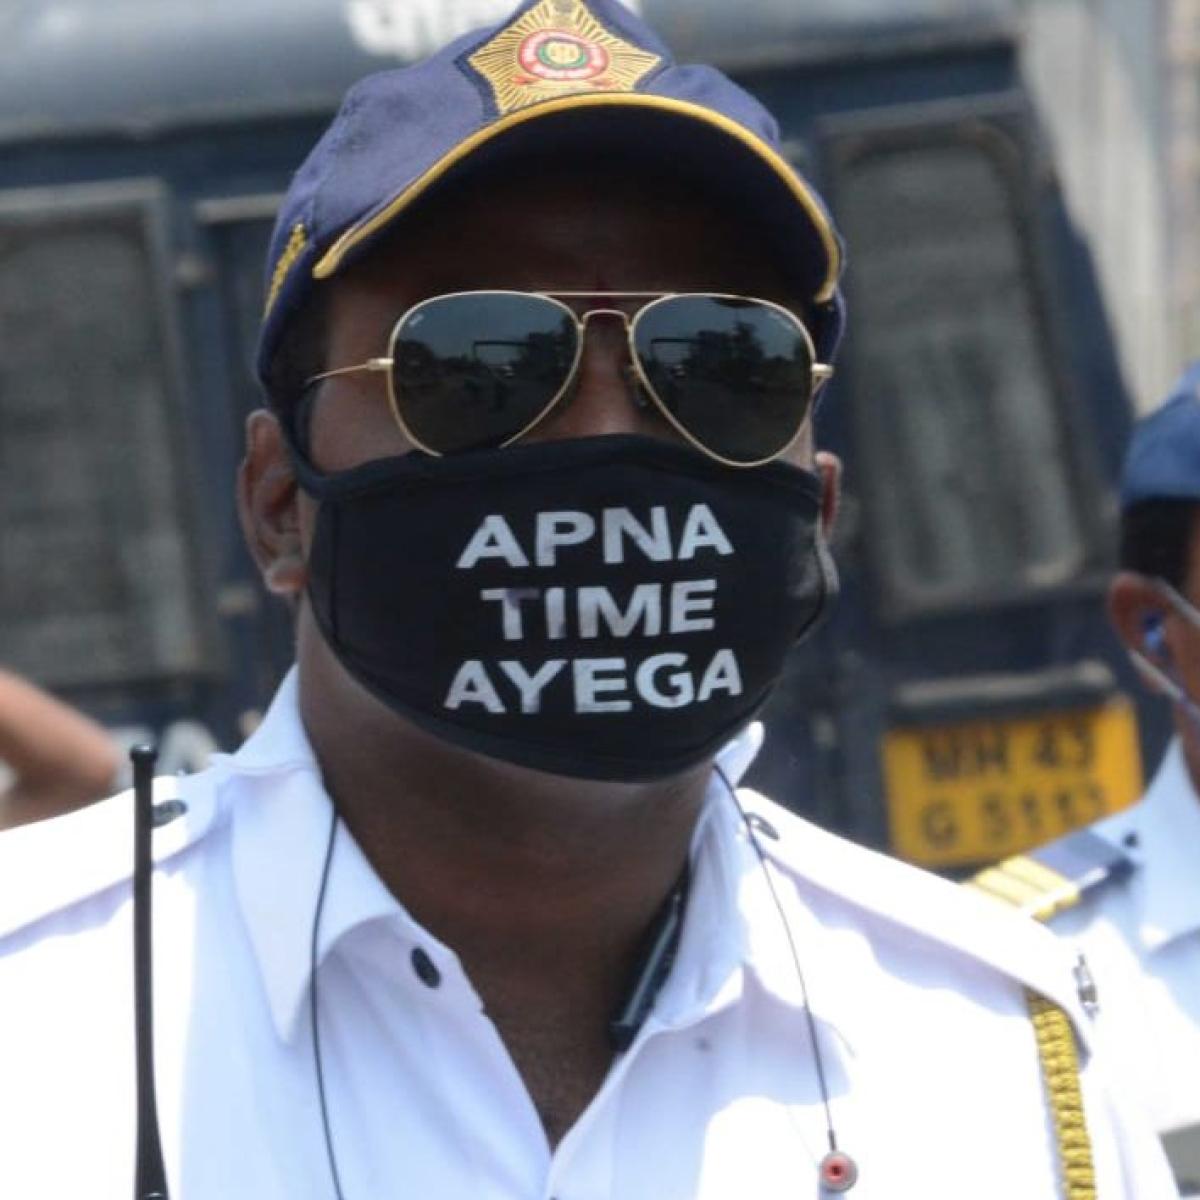 Coronavirus in Mira Bhayandar: Traffic police registers 5,726 cases for defying lockdown, net Rs 23 lakh fine in 10 Days